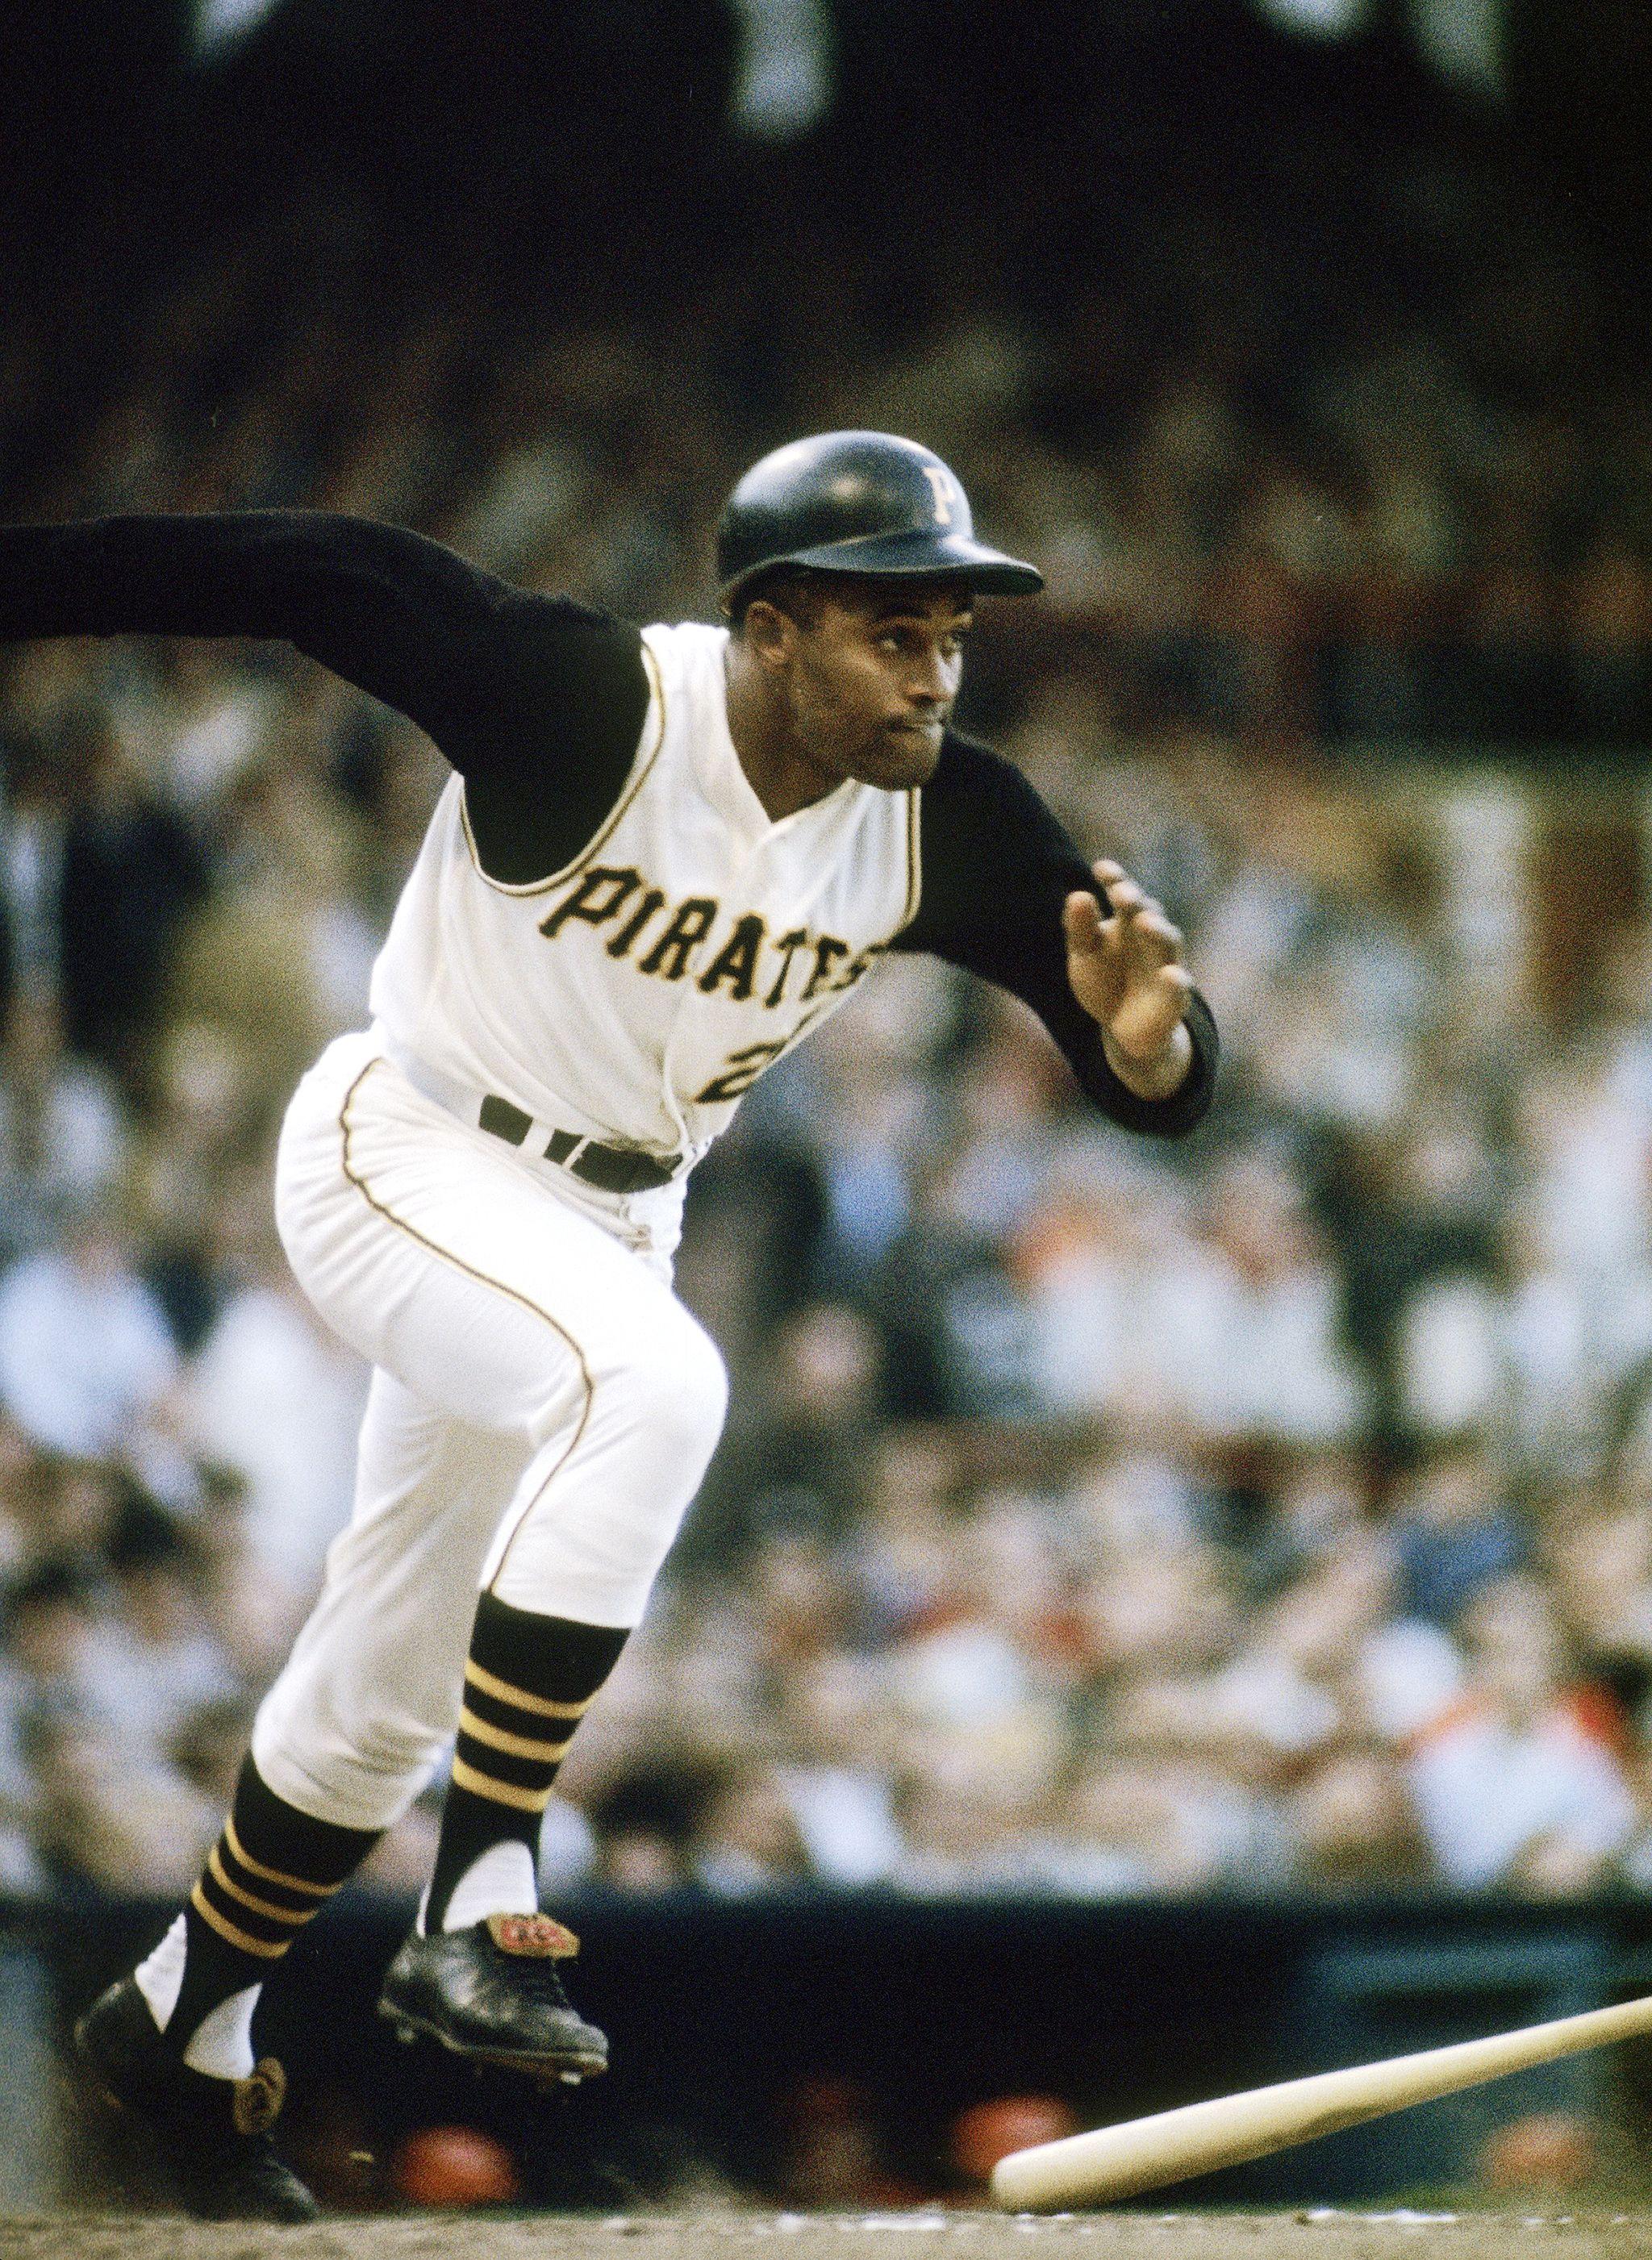 Roberto Clemente S Life And Career In Photos Roberto Clemente Pittsburgh Pirates Baseball Pirates Baseball